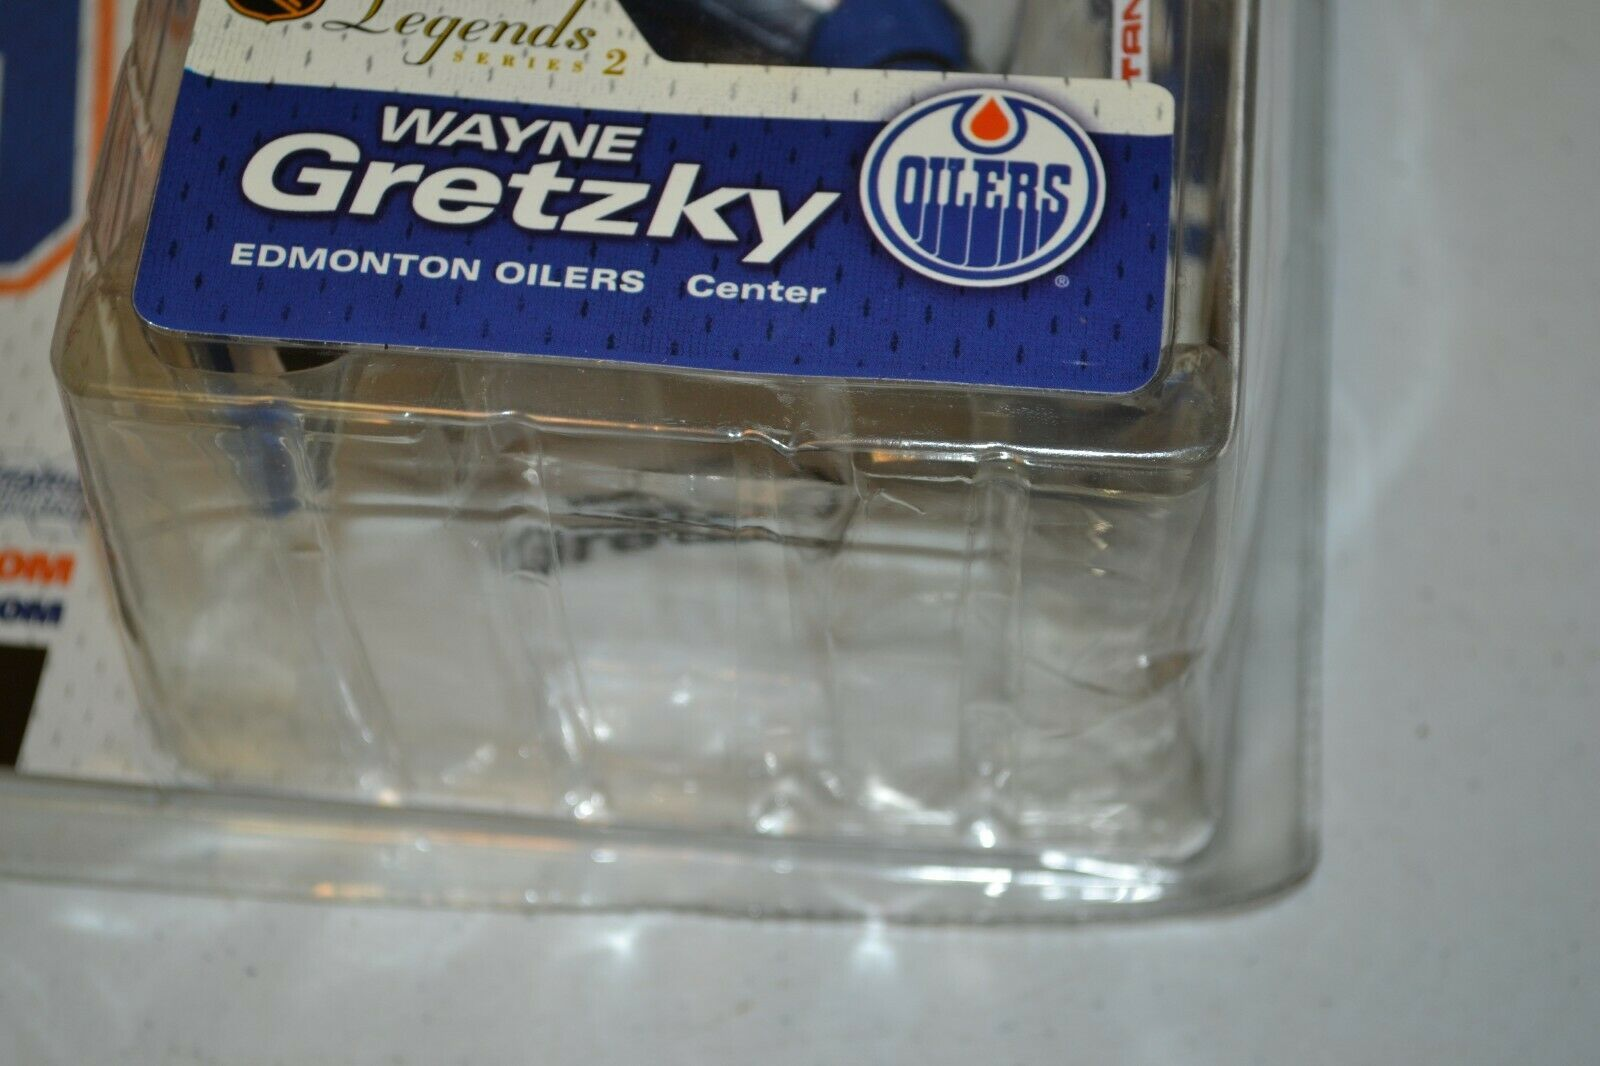 2005 McFarlane NHL Legends Series 2 Wayne Gretzky #99 Edmonton Oilers Figure image 7